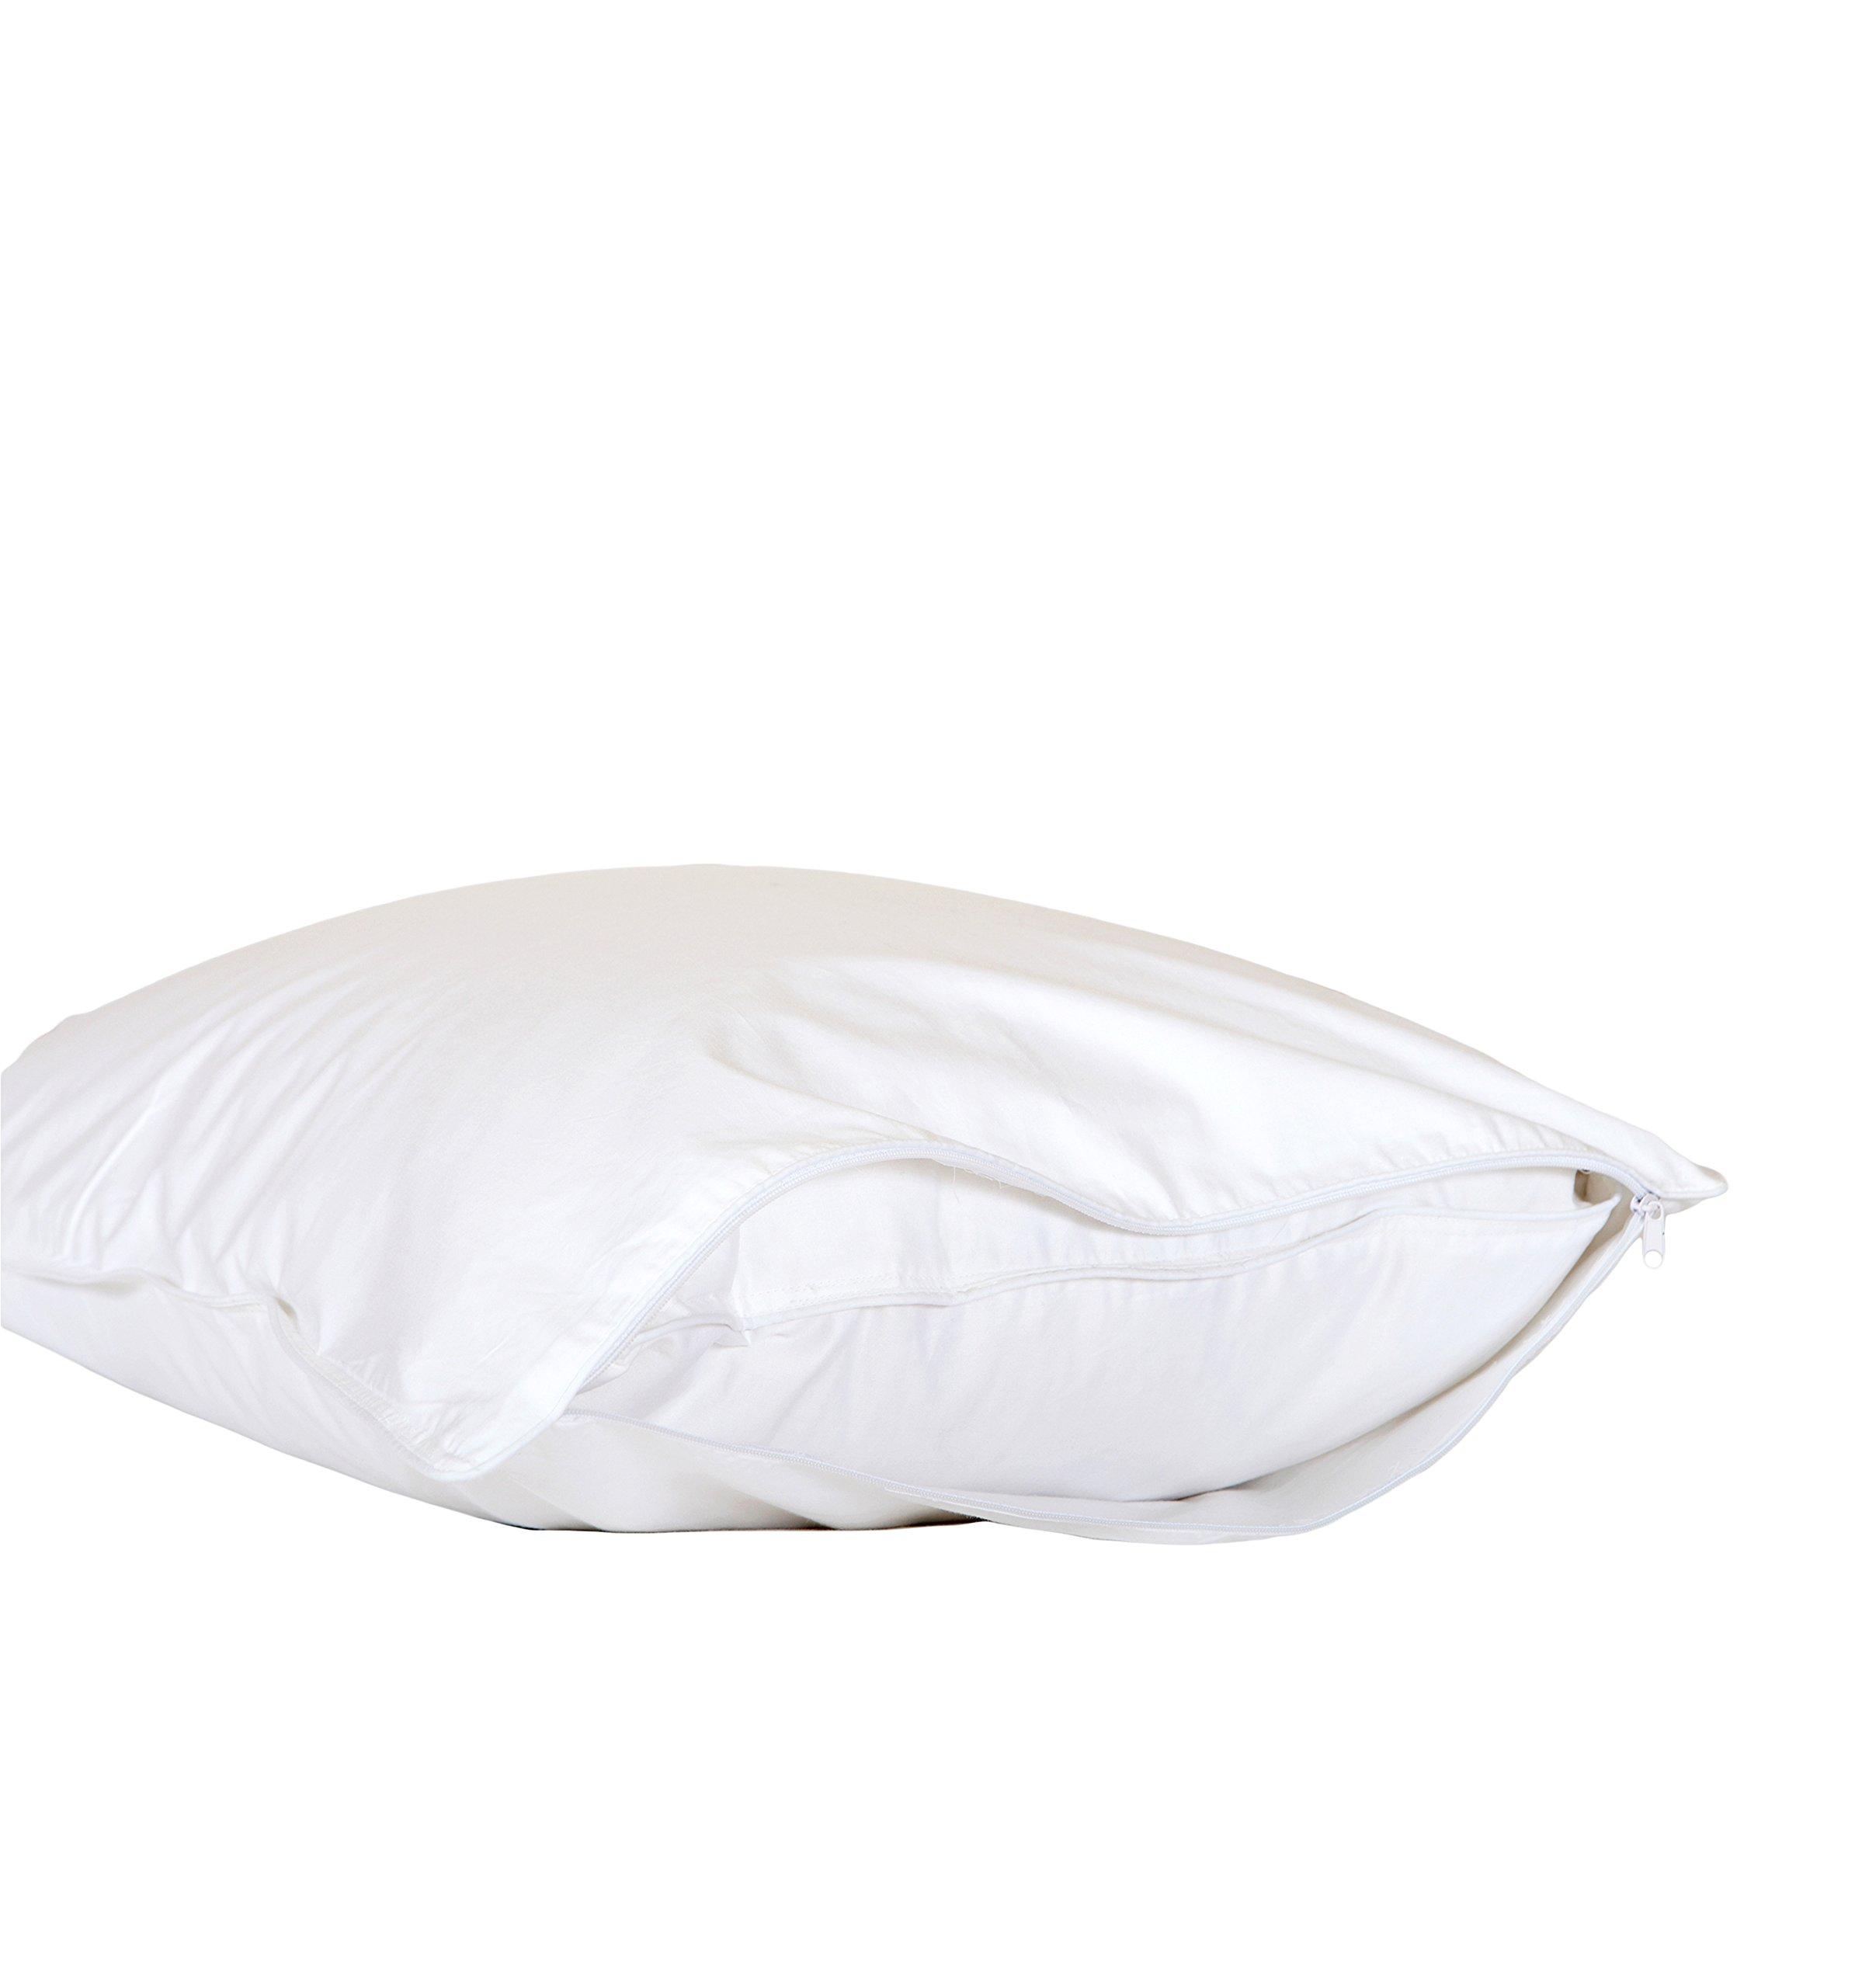 Cloud Nine Comforts Contessa Pillow Protector, King, White